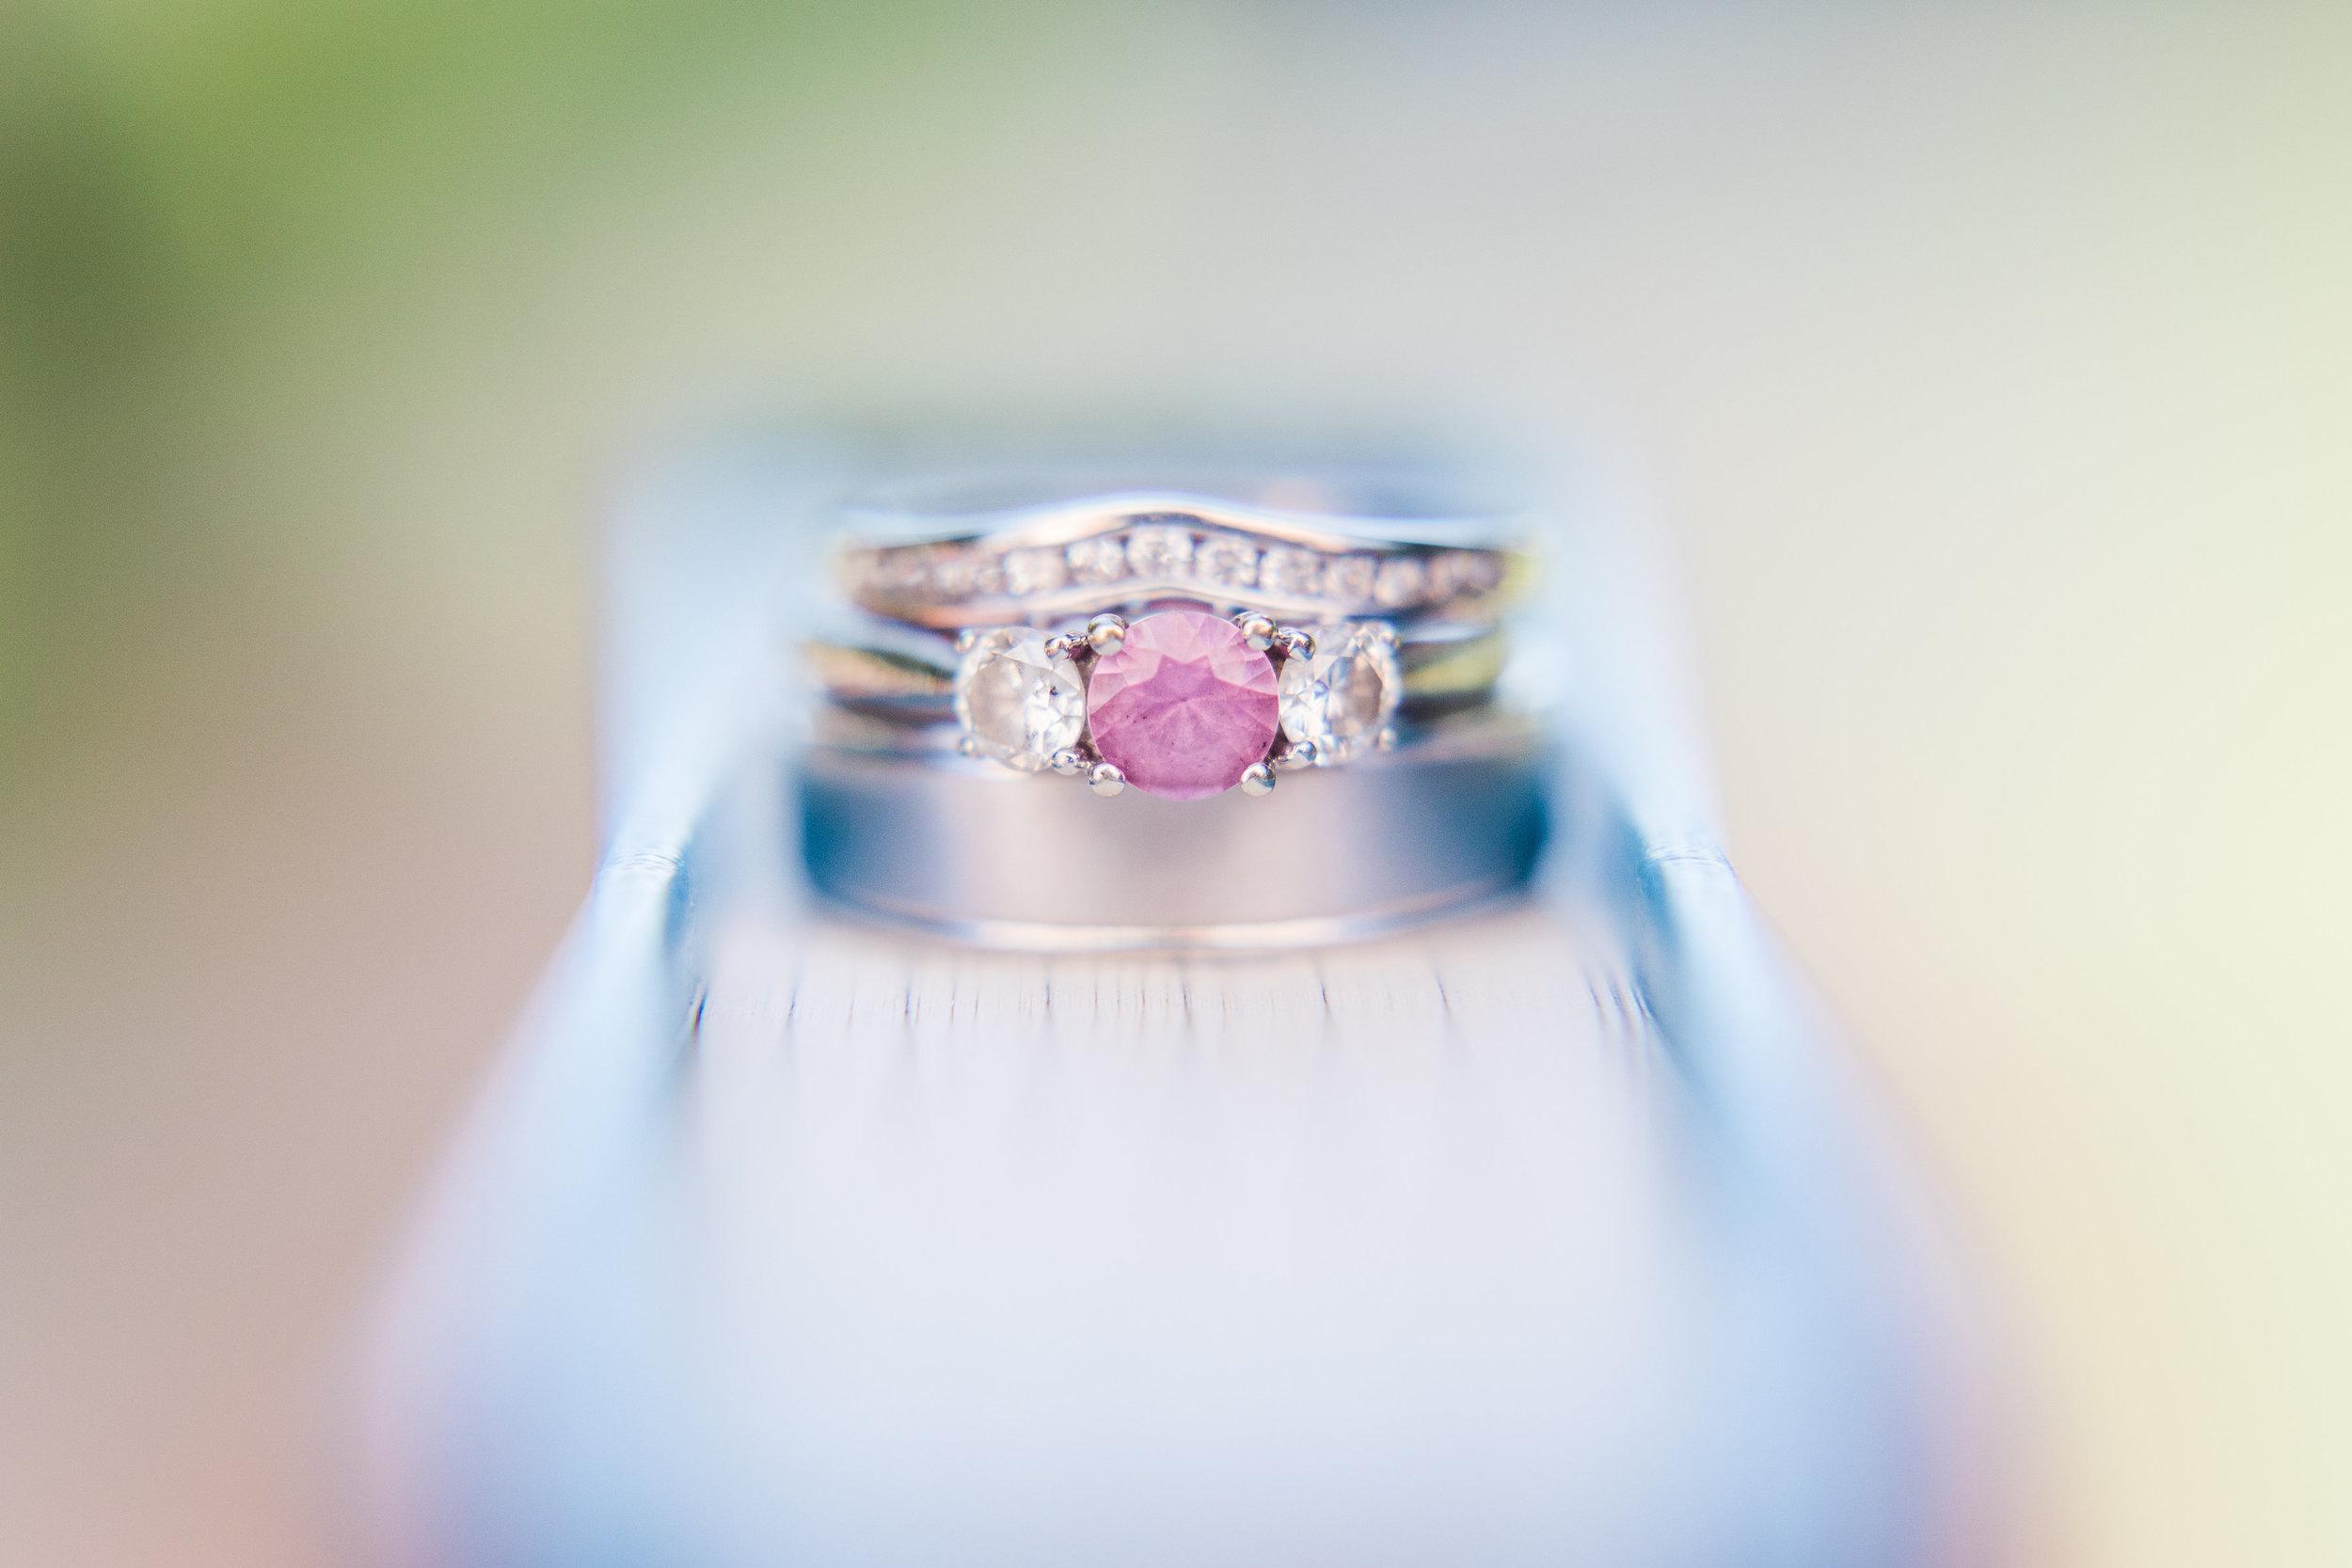 Book_Wedding_Ring